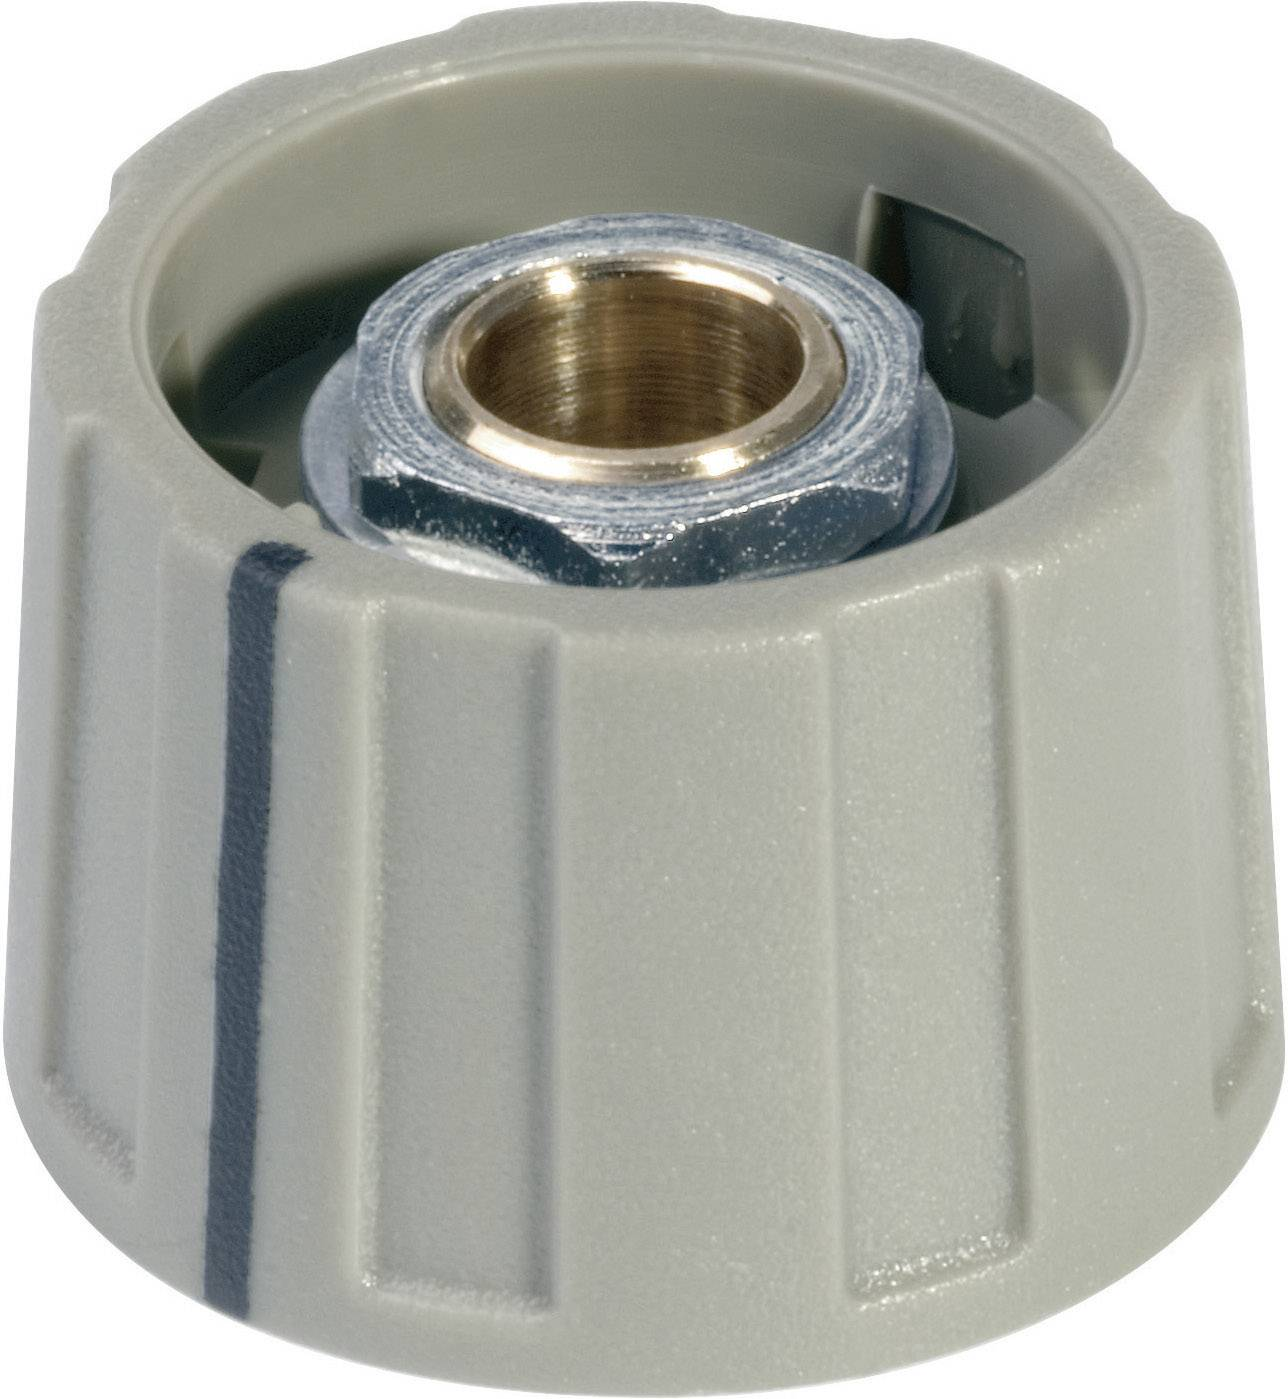 Otočný knoflík bez ukazatele (/O 23 mm) OKW, 6 mm, šedá